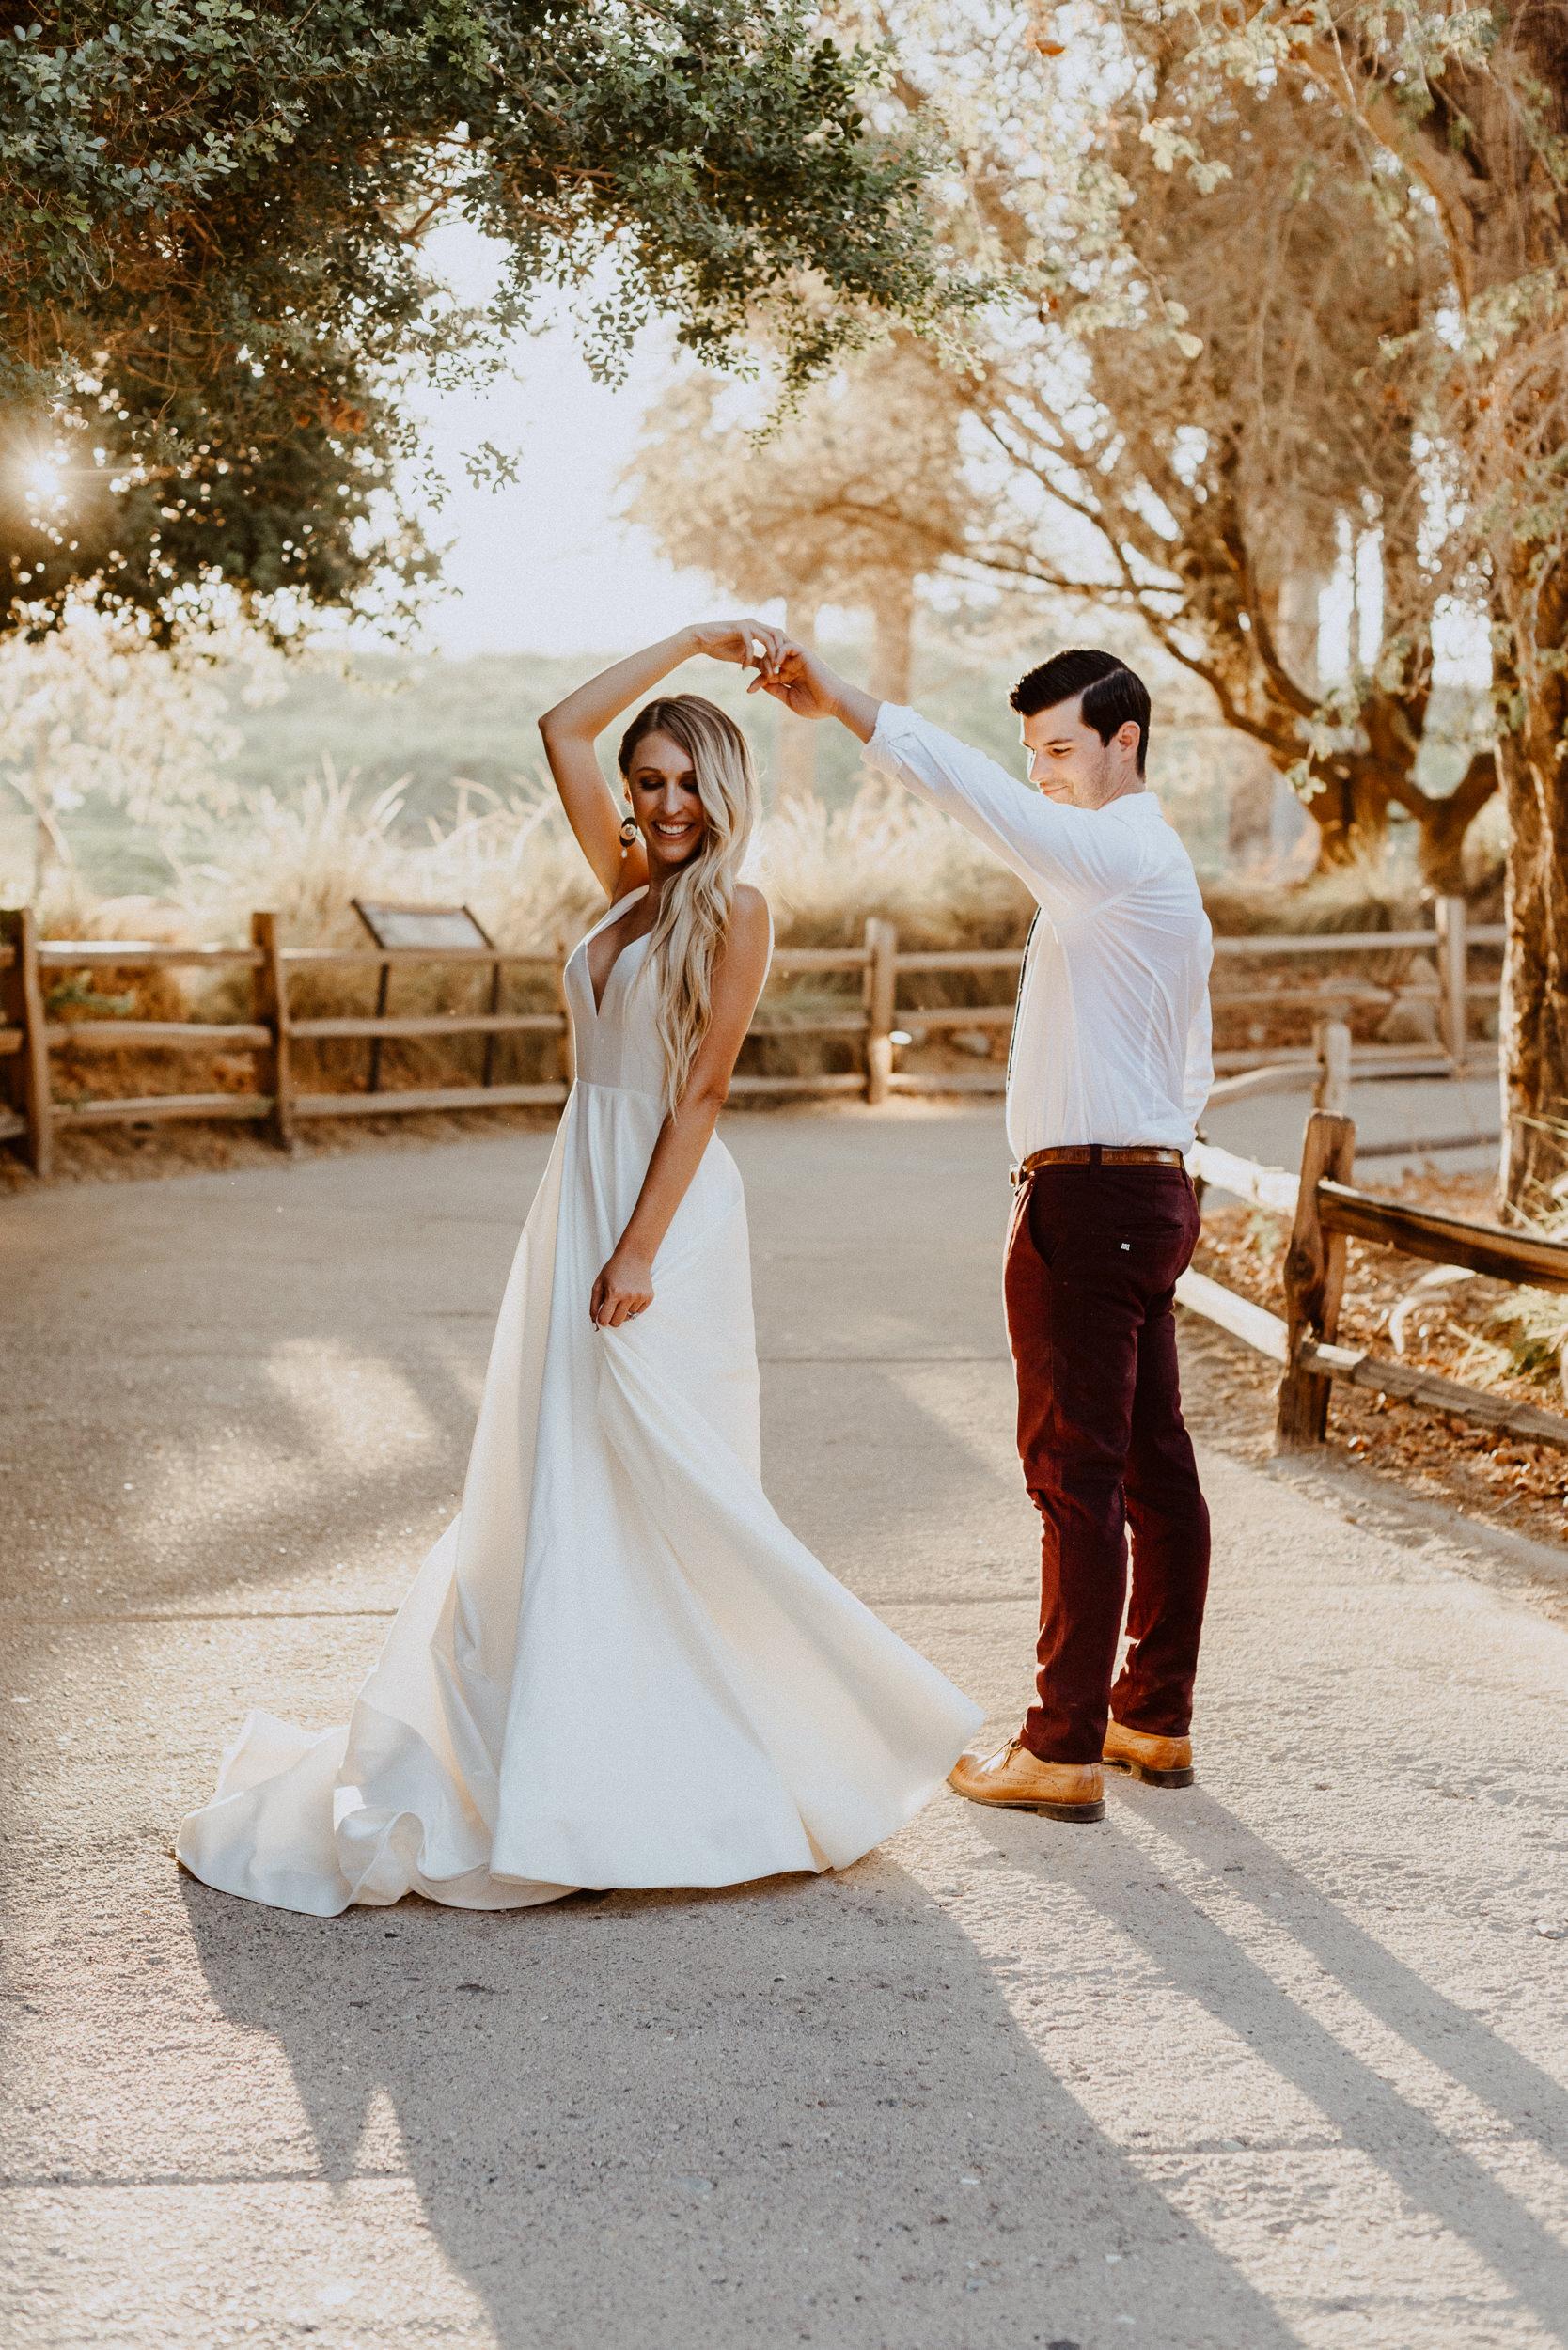 sChelsie + Chris - The Desert Shootout Wedding Romantics at The Living Desert-142.jpg